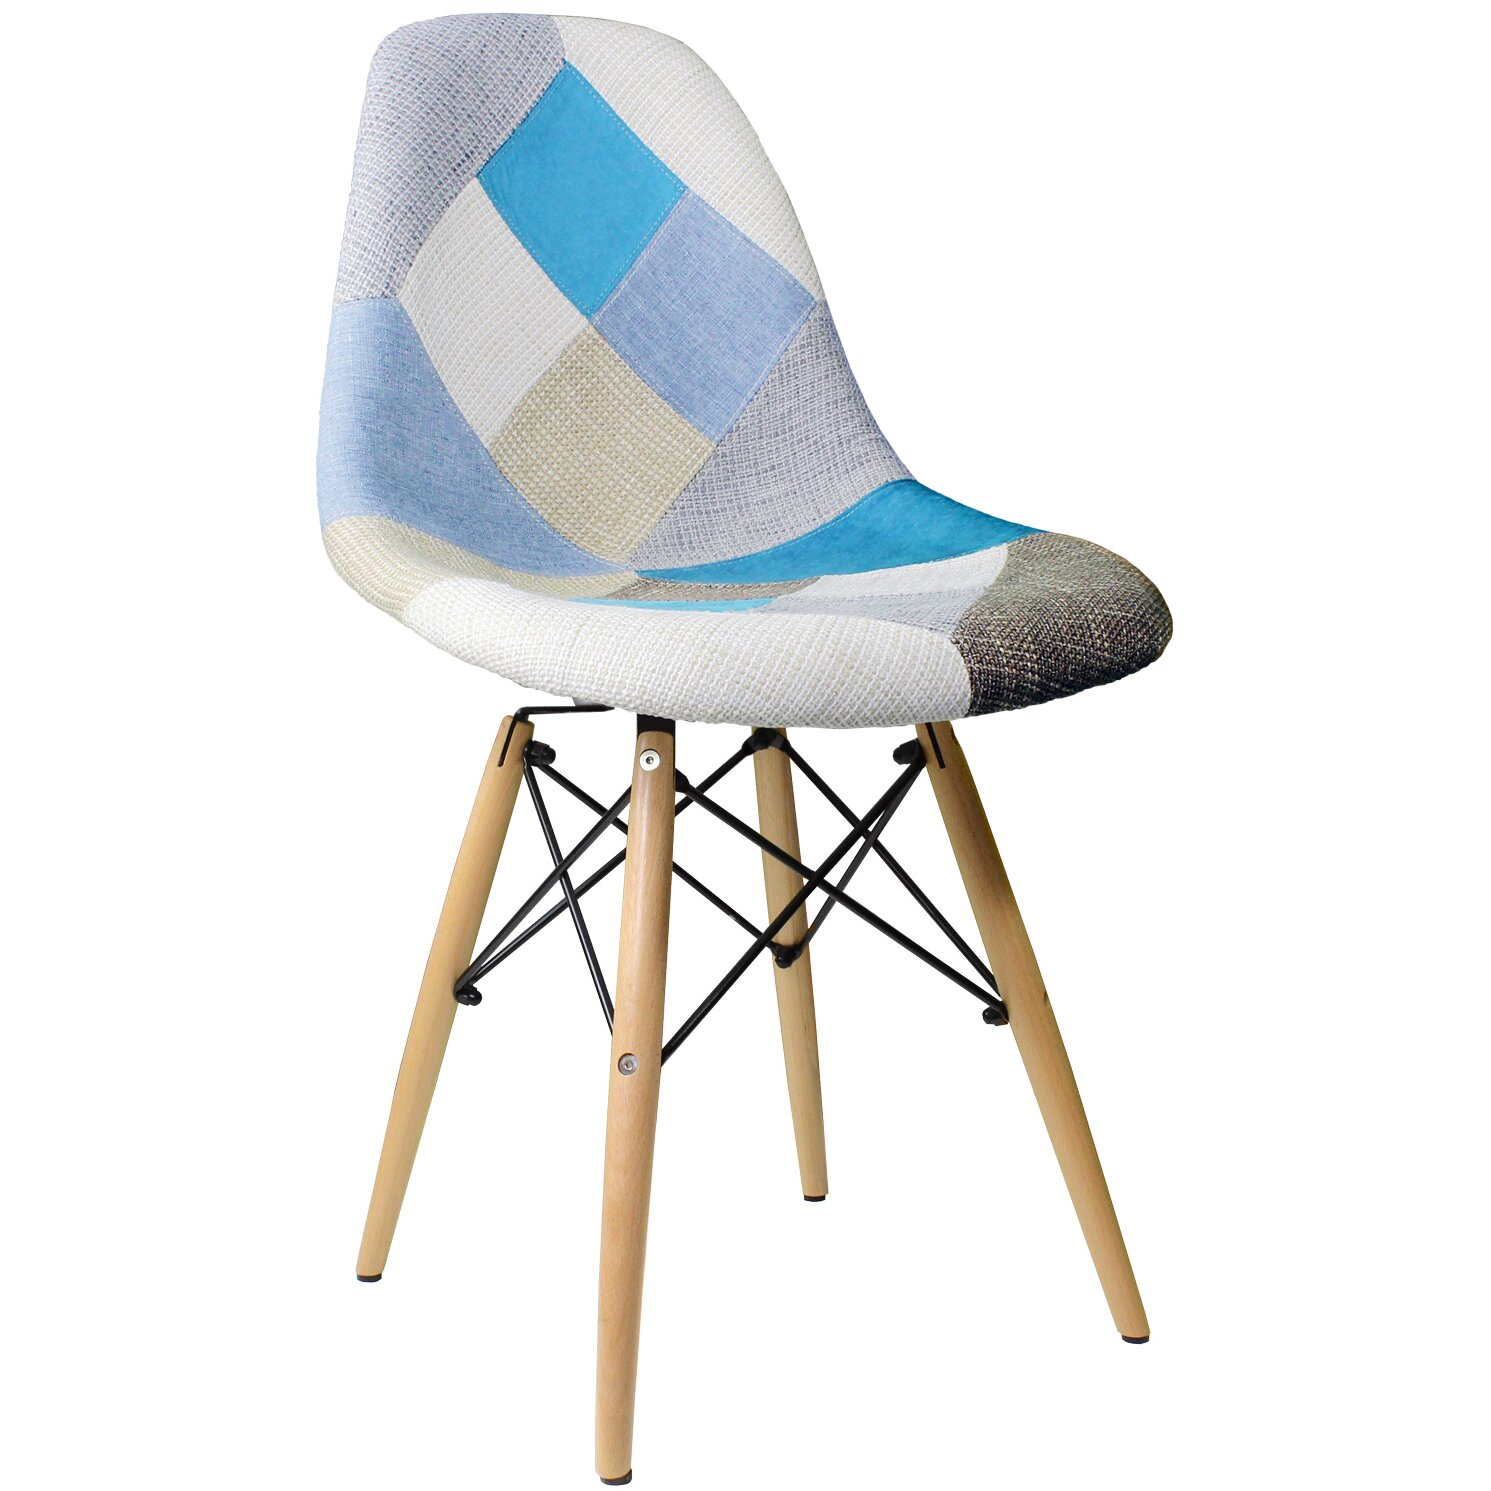 Emodern decor side chair reviews wayfair for Emodern decor